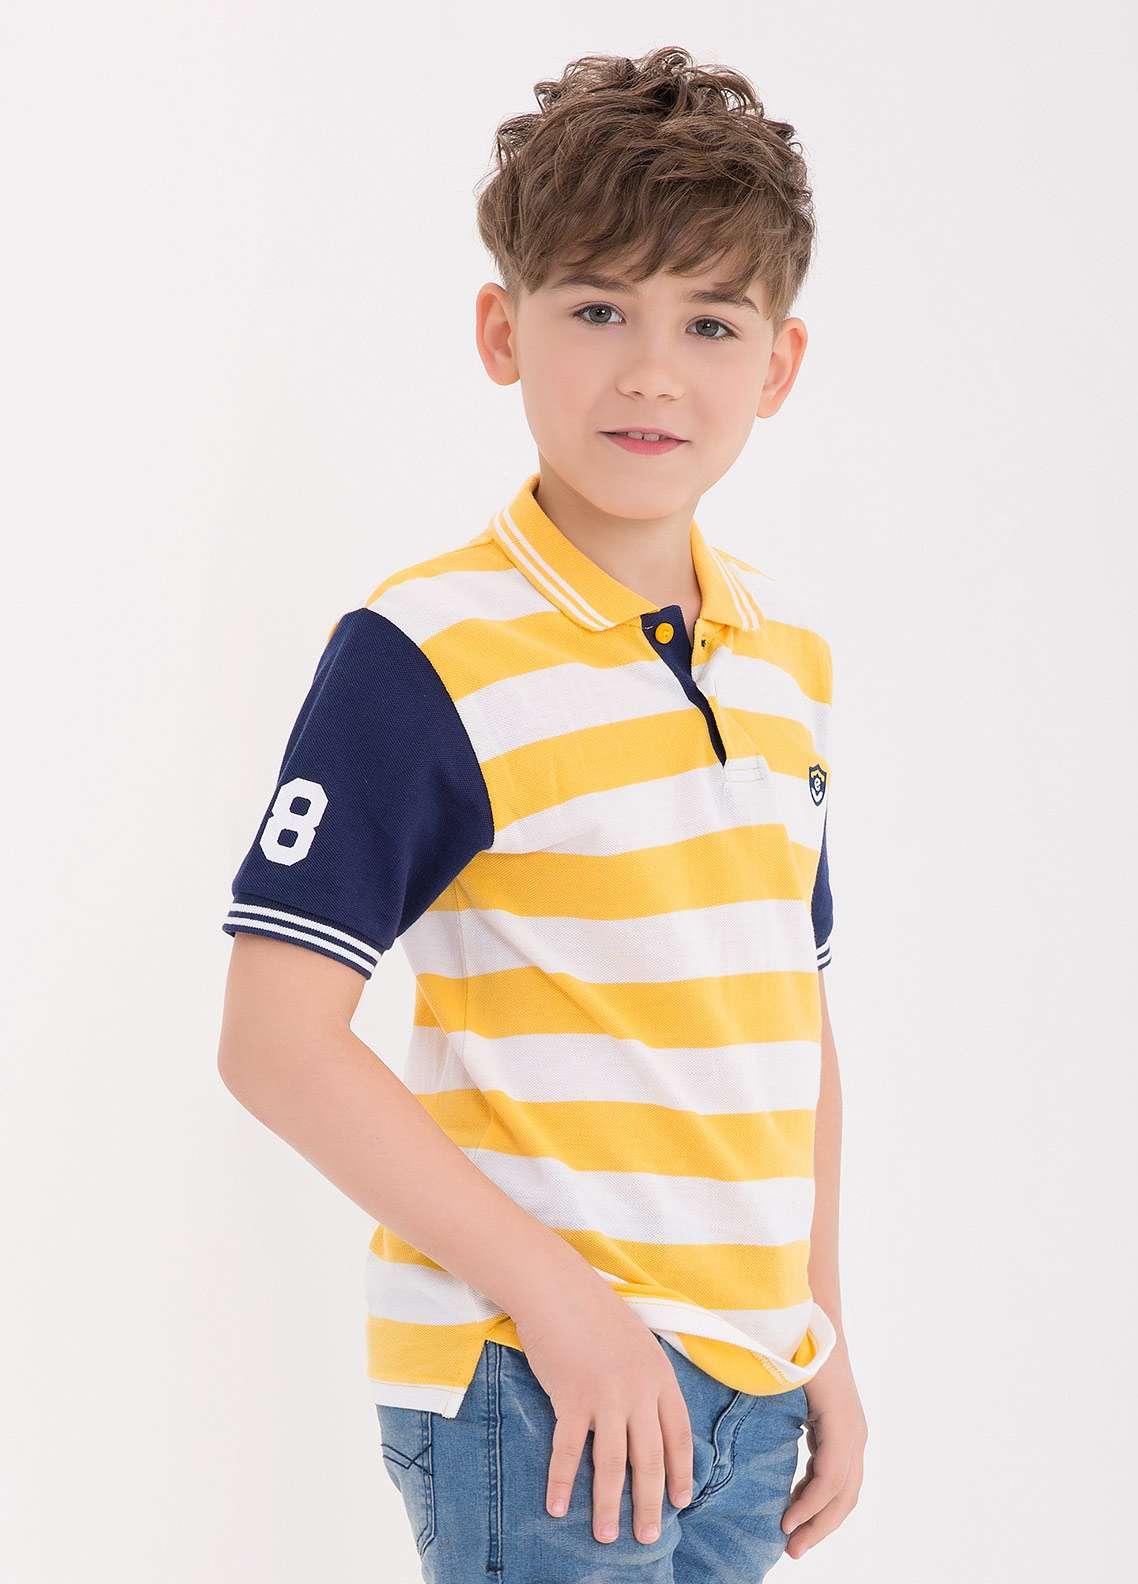 Edenrobe Cotton Polo Shirts for Boys - Yellow EDK18PS 016